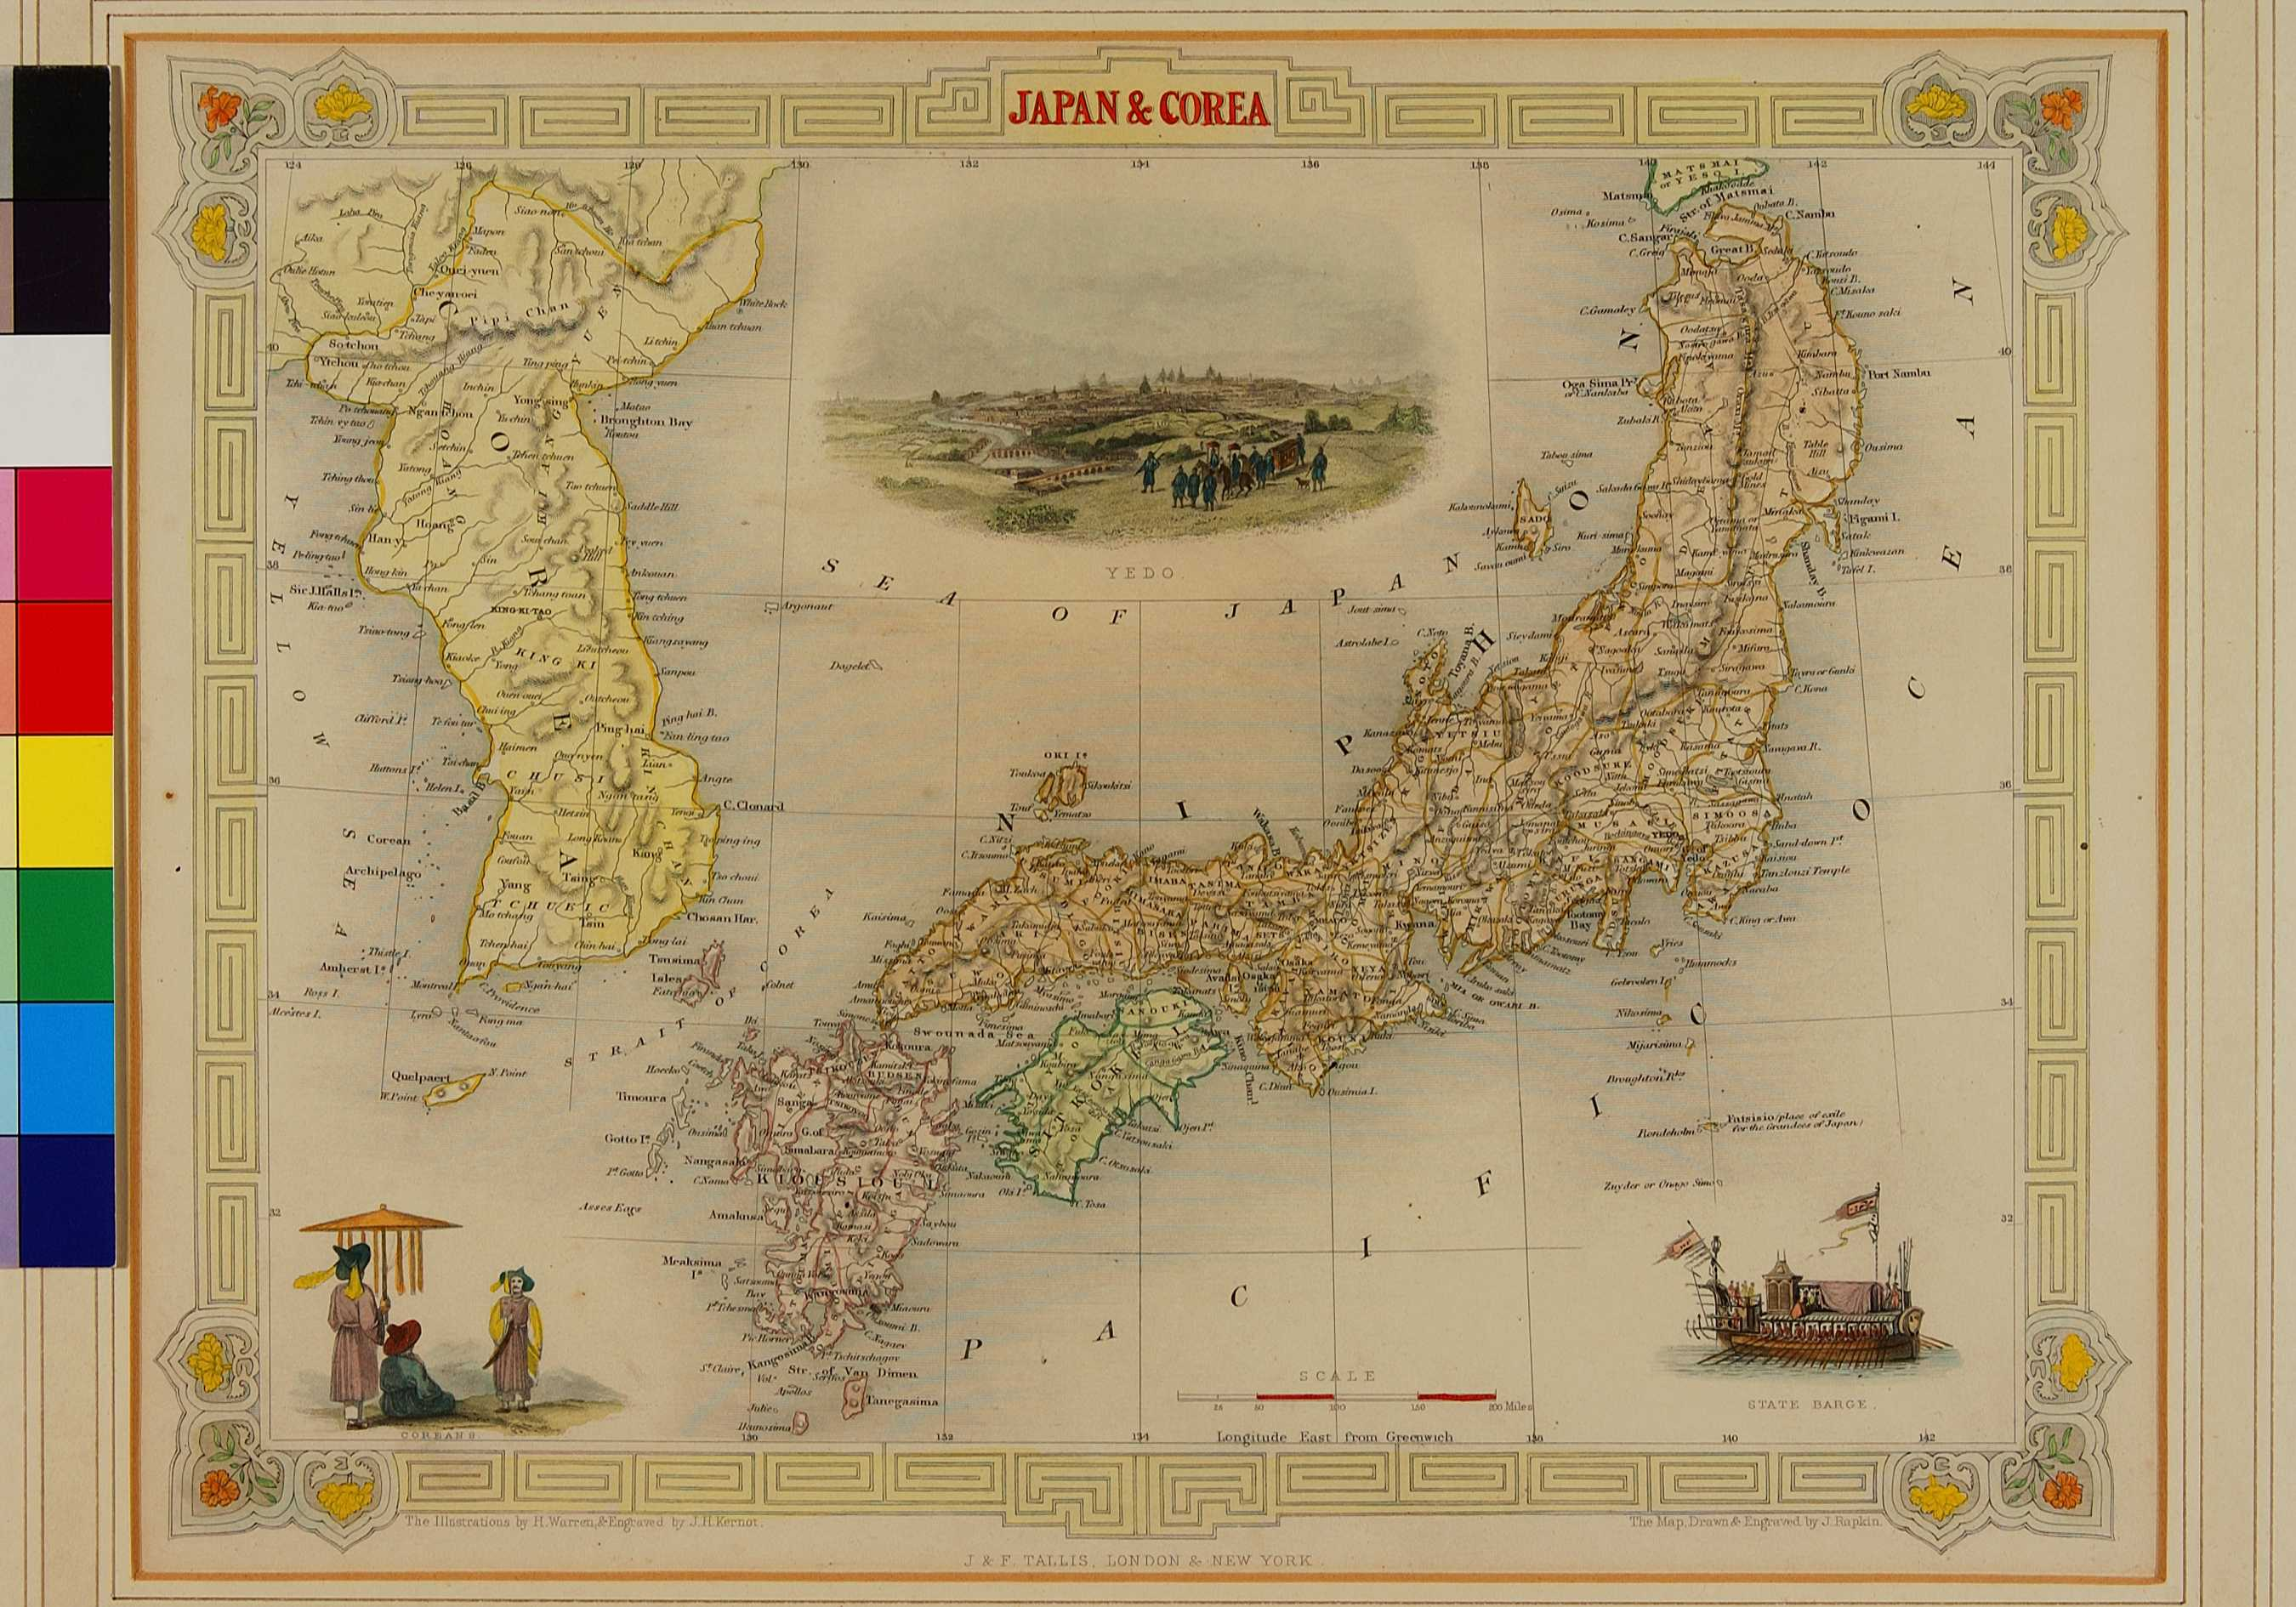 cortazzi035 : Japan & Corea